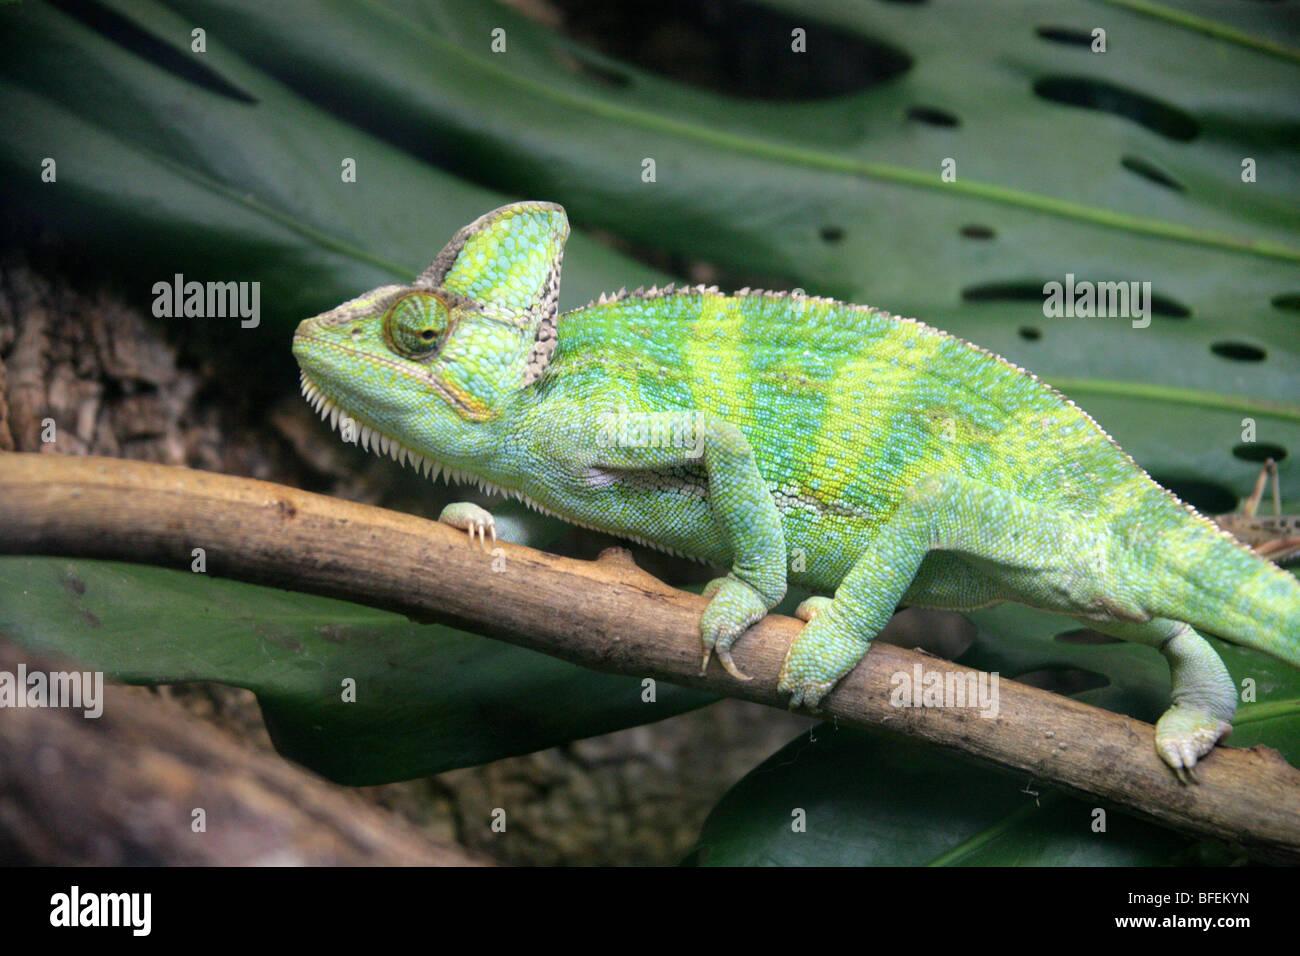 Yemen Veiled Chameleon aka Cone-headed Chameleon or Casqued Chameleon Chamaeleo calyptratus, Saudi Arabia and Yemen Stock Photo